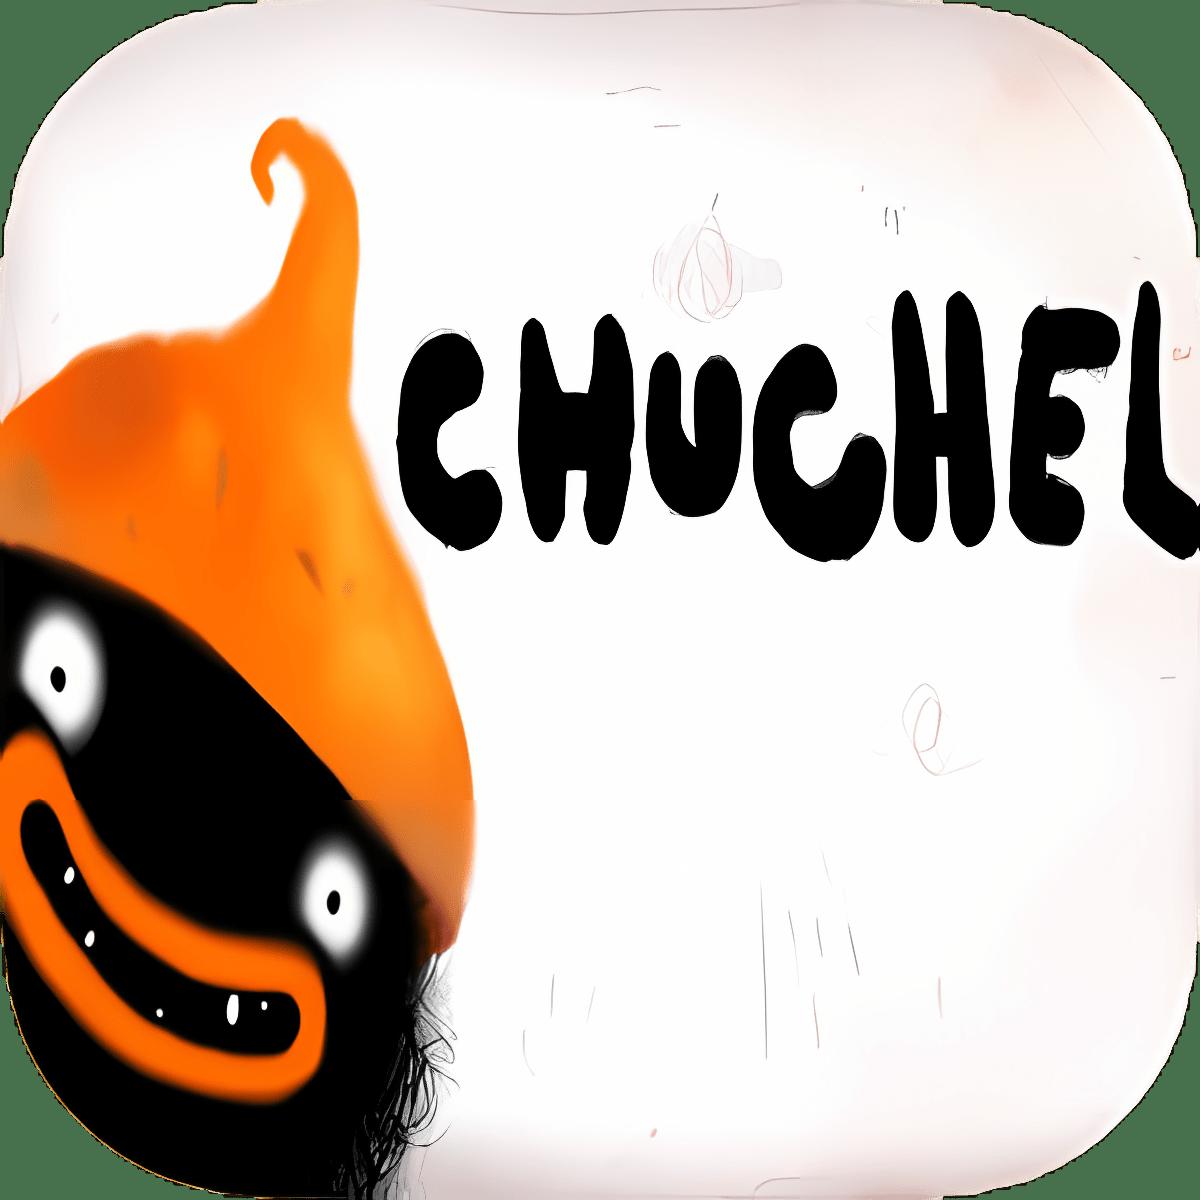 Chuchel Adventure